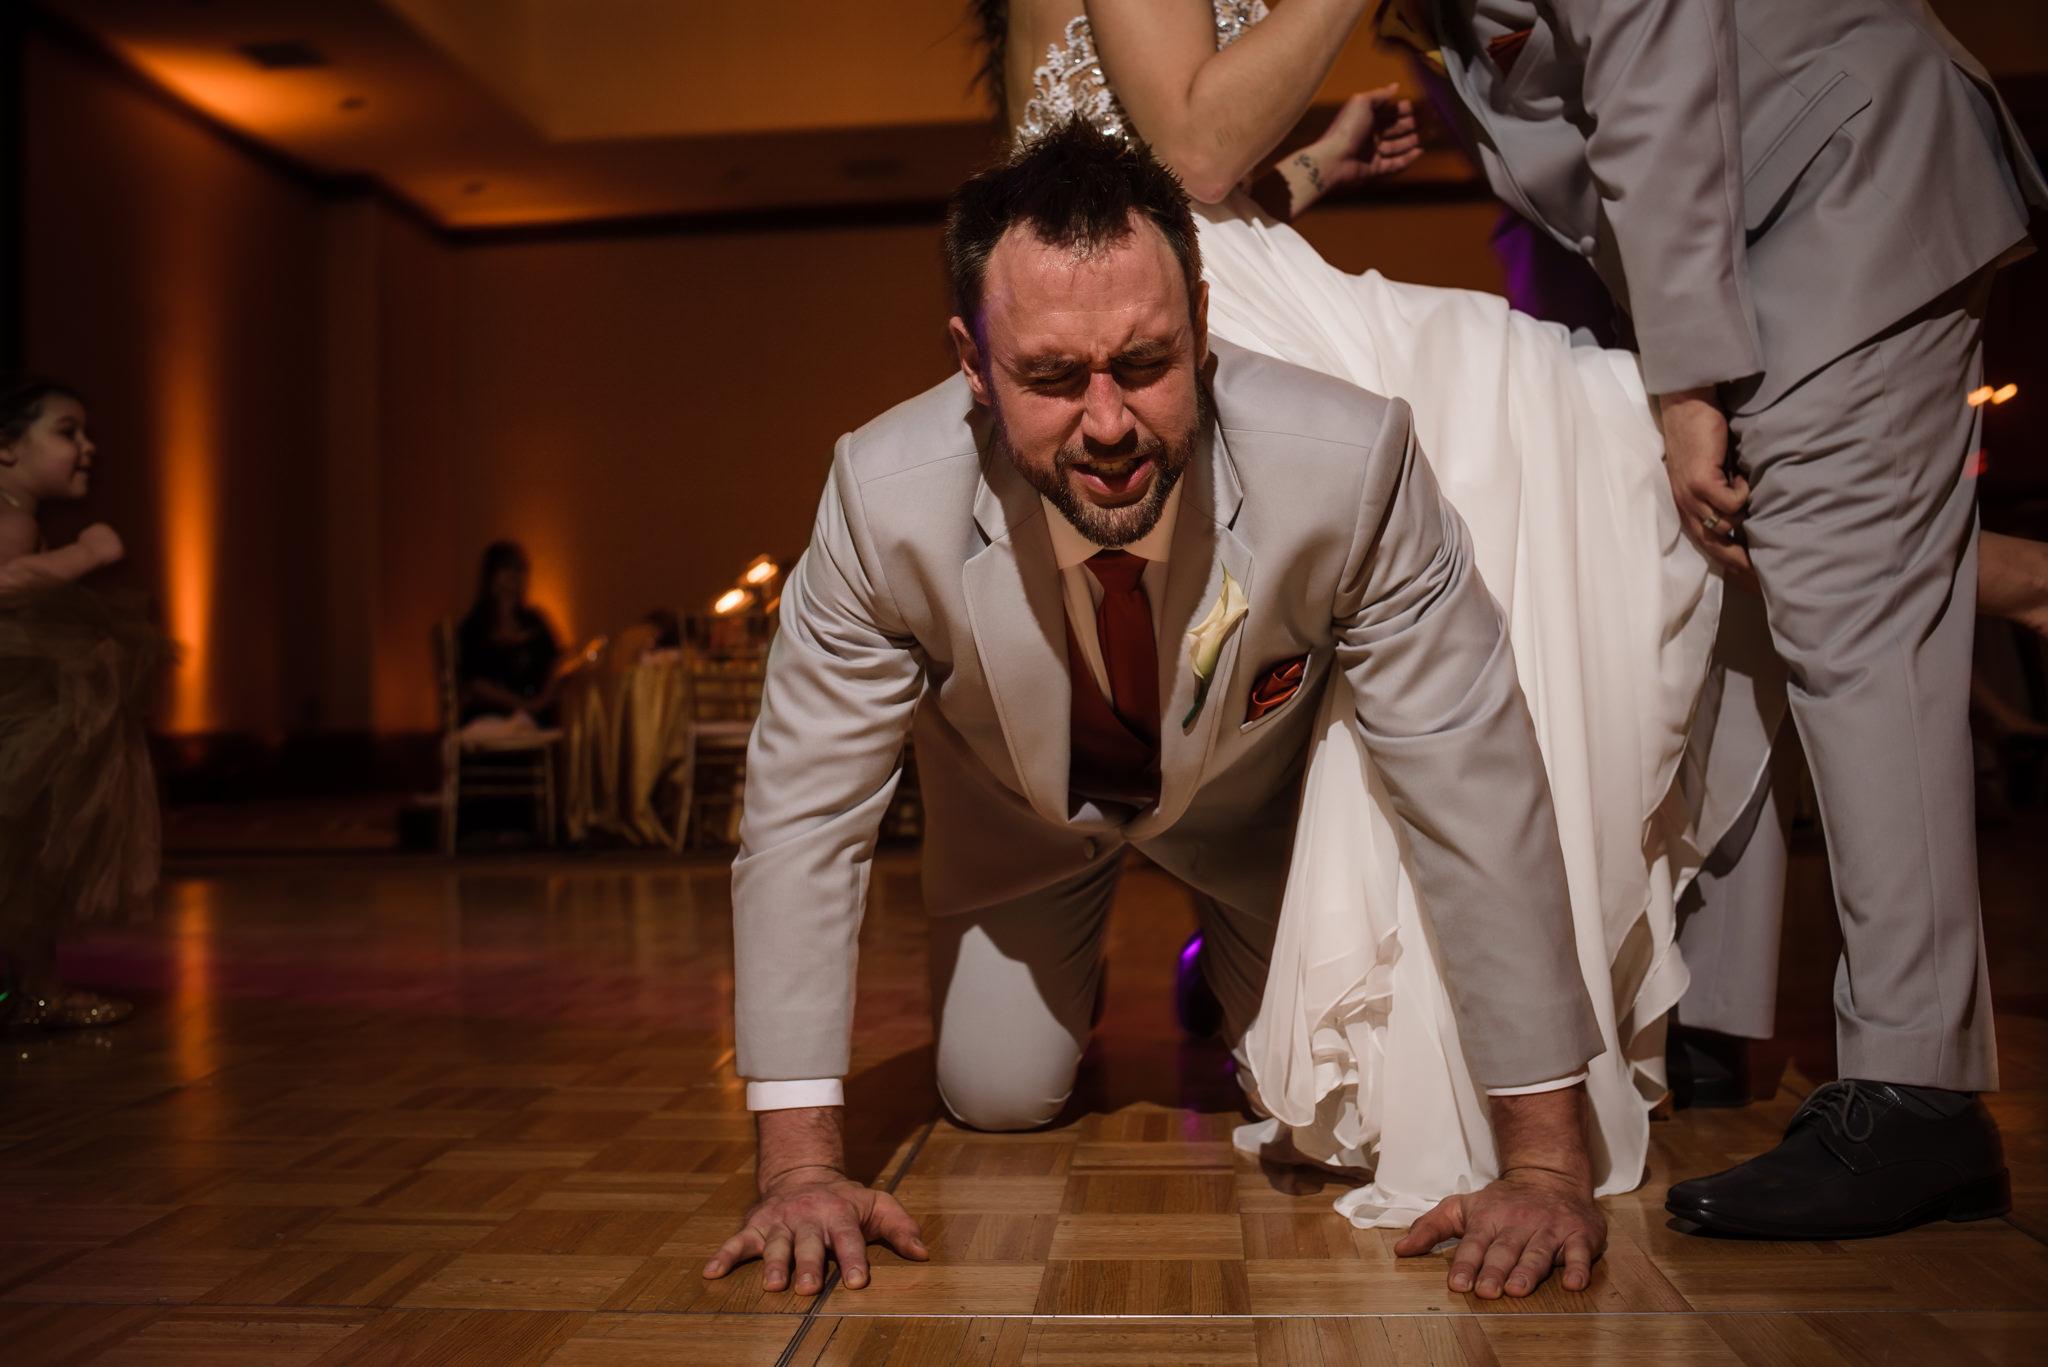 HILTON-OMAHA-WEDDING-PHOTOGRAPHER-JM-STUDIOS-OMAHA-LIV-BRICE-037.jpg